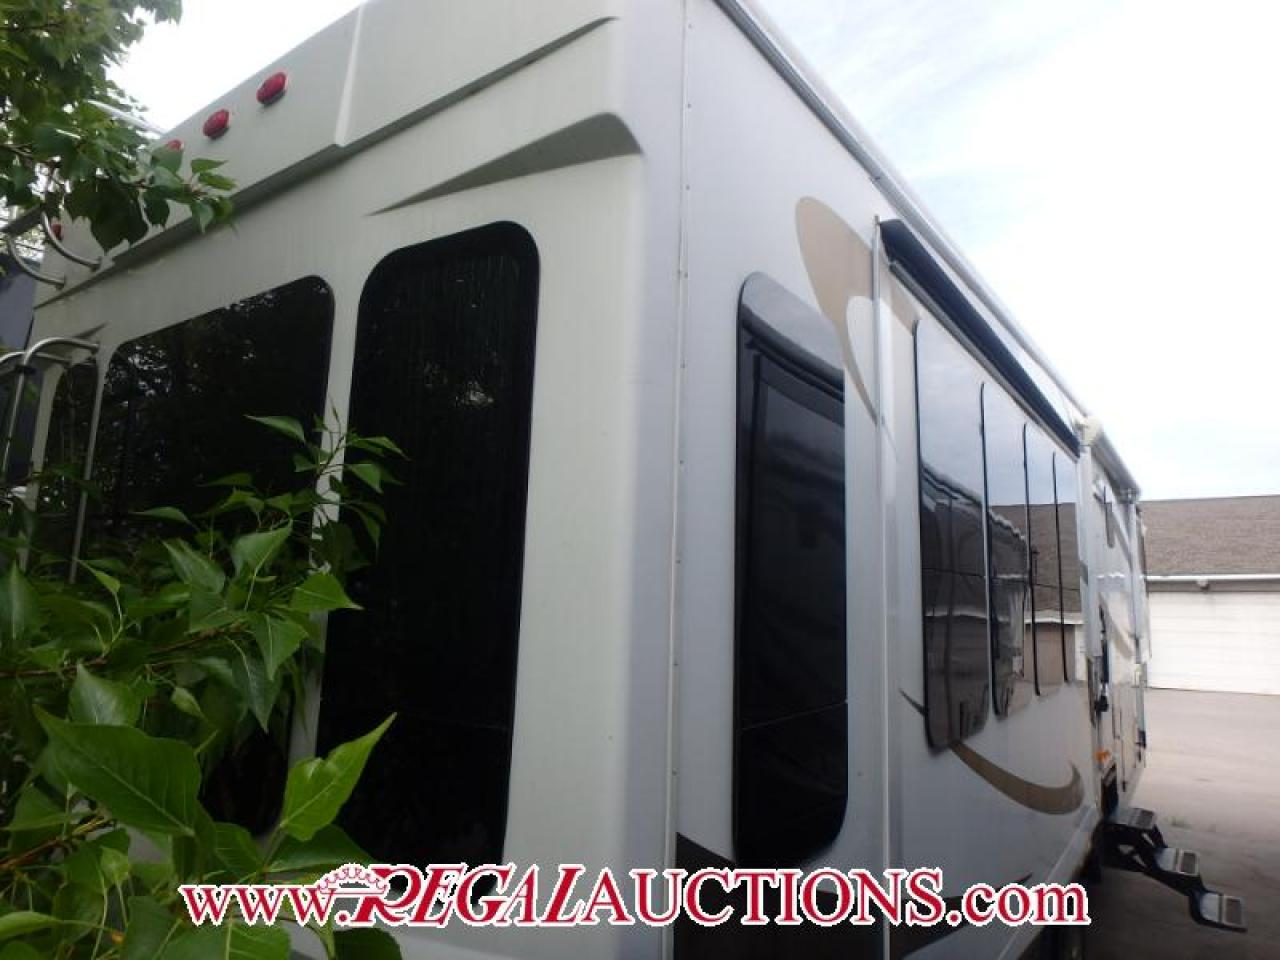 2008 Carriage CARRI-LITE 36XTRM5  FIFTH WHEEL